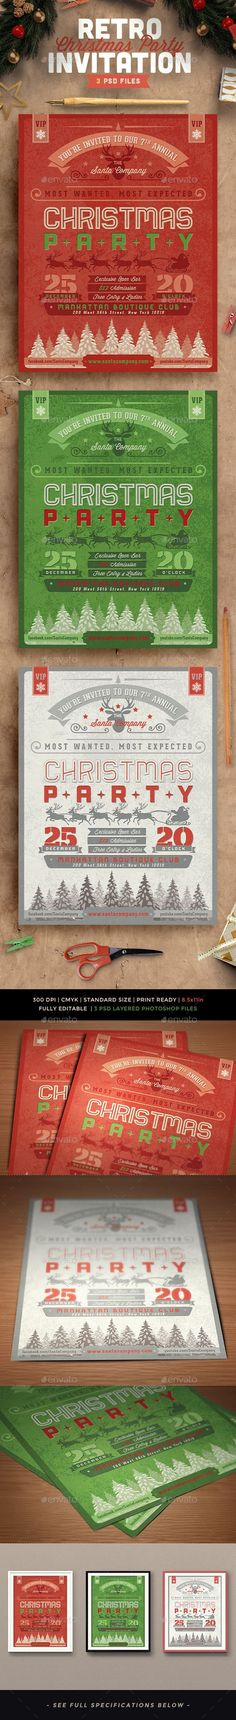 Retro Christmas Party Invitation Template PSD #design Download: http://graphicriver.net/item/retro-christmas-party-invitation/13216367?ref=ksioks